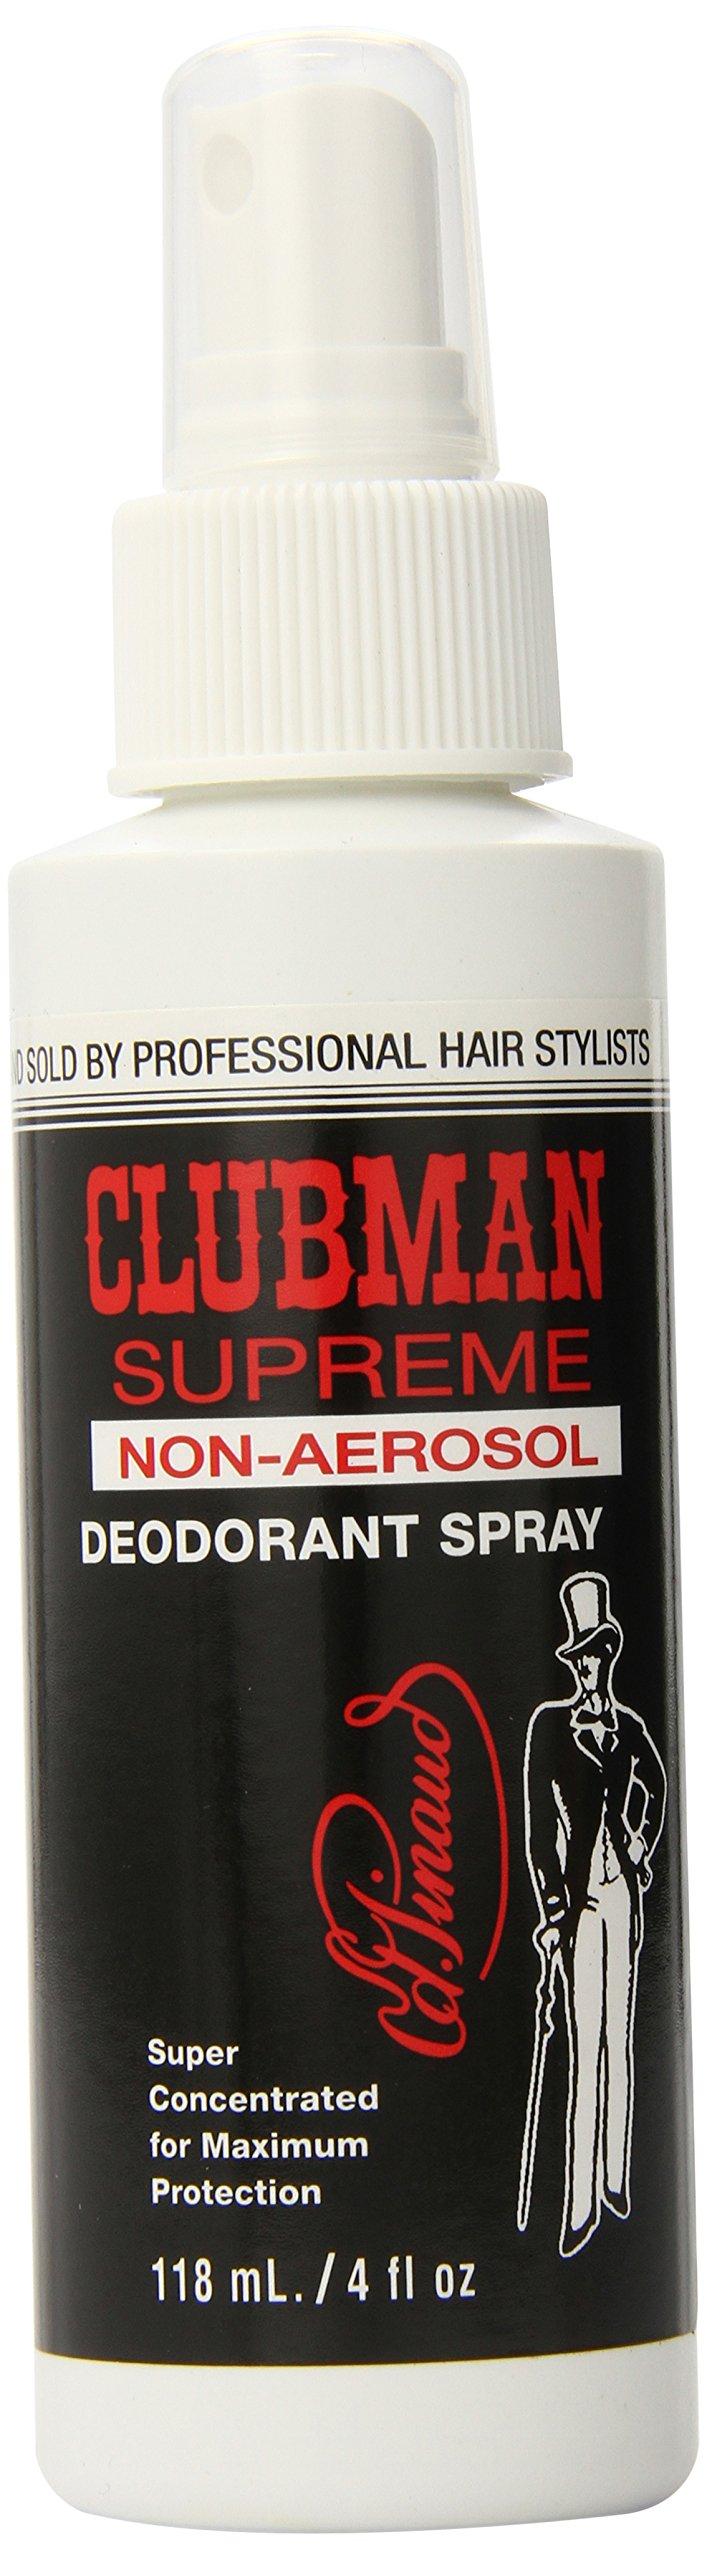 Clubman Non-Aerosol Deodorant Spray, 4 Ounce